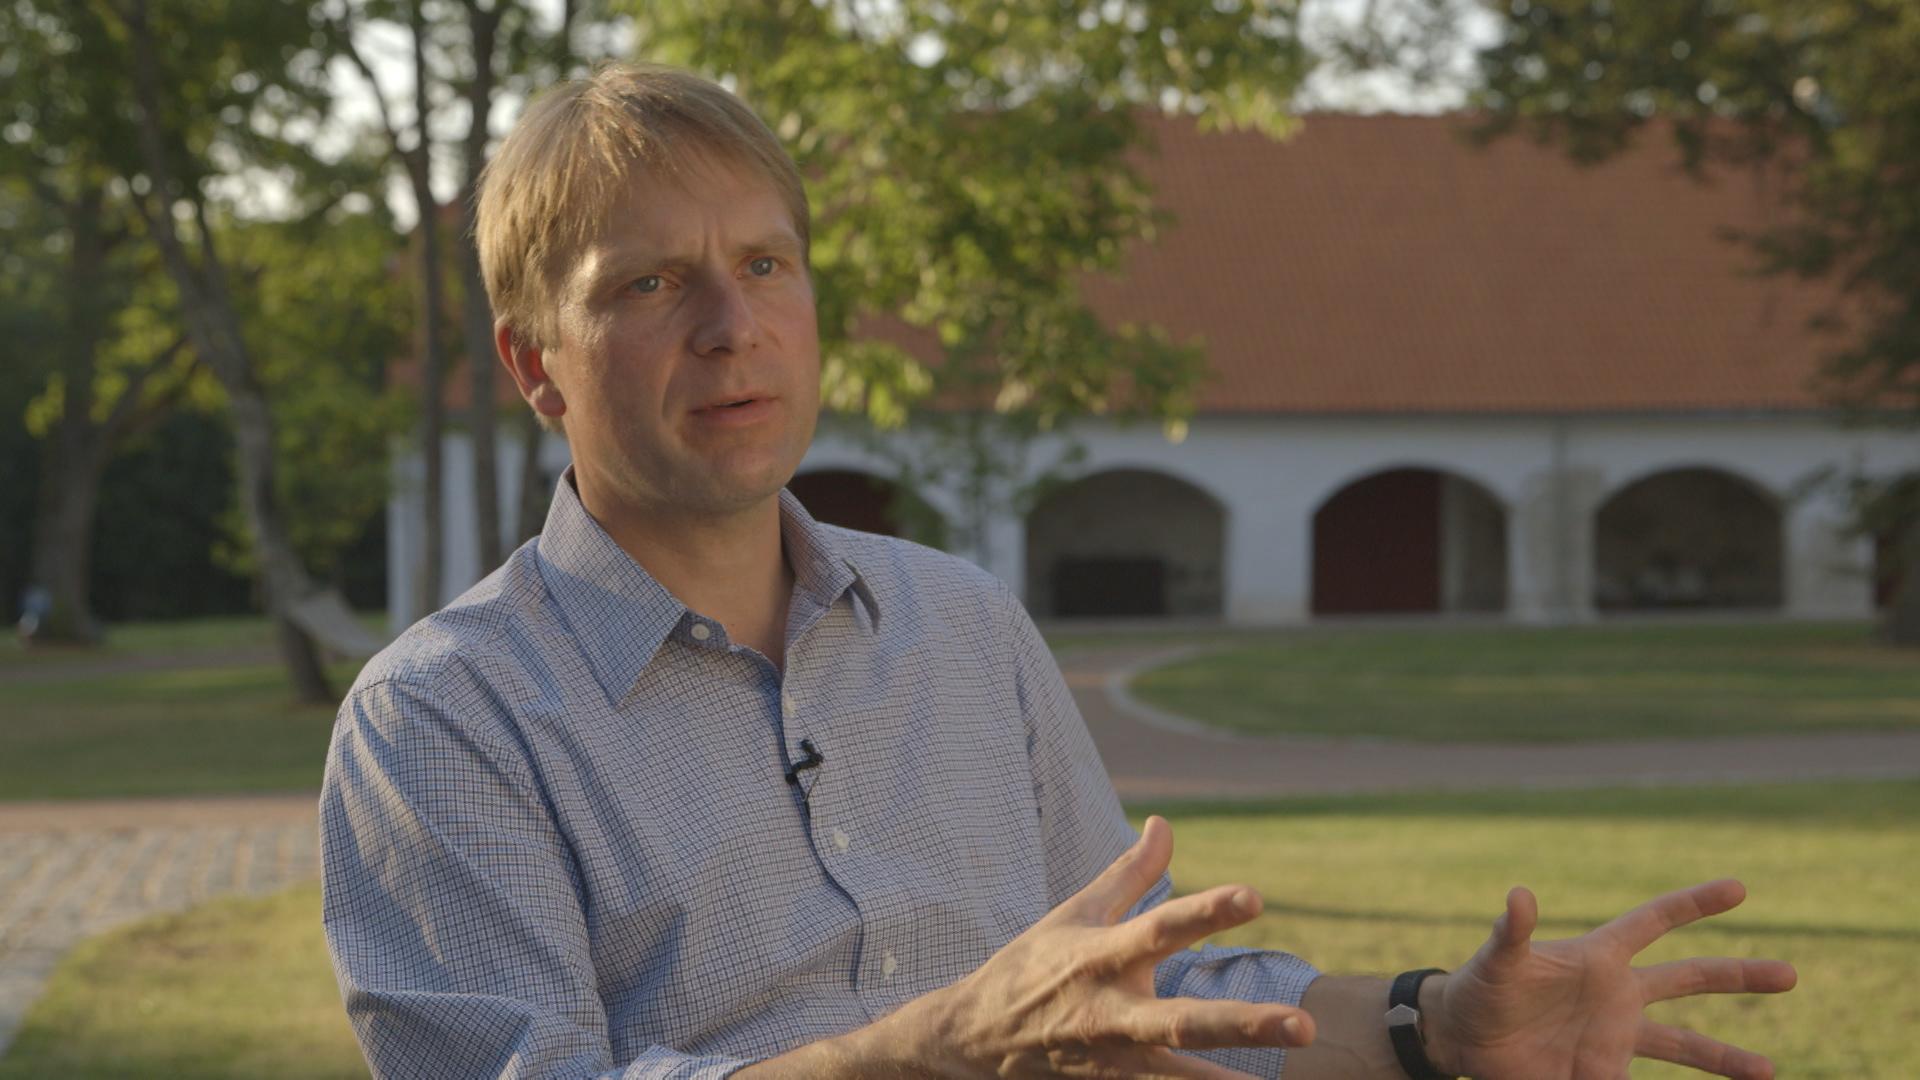 Eerik - Niiles Kross, former Estonian diplomat and the head of secret service. PHOTO: Re:Baltica/Mistrus Media